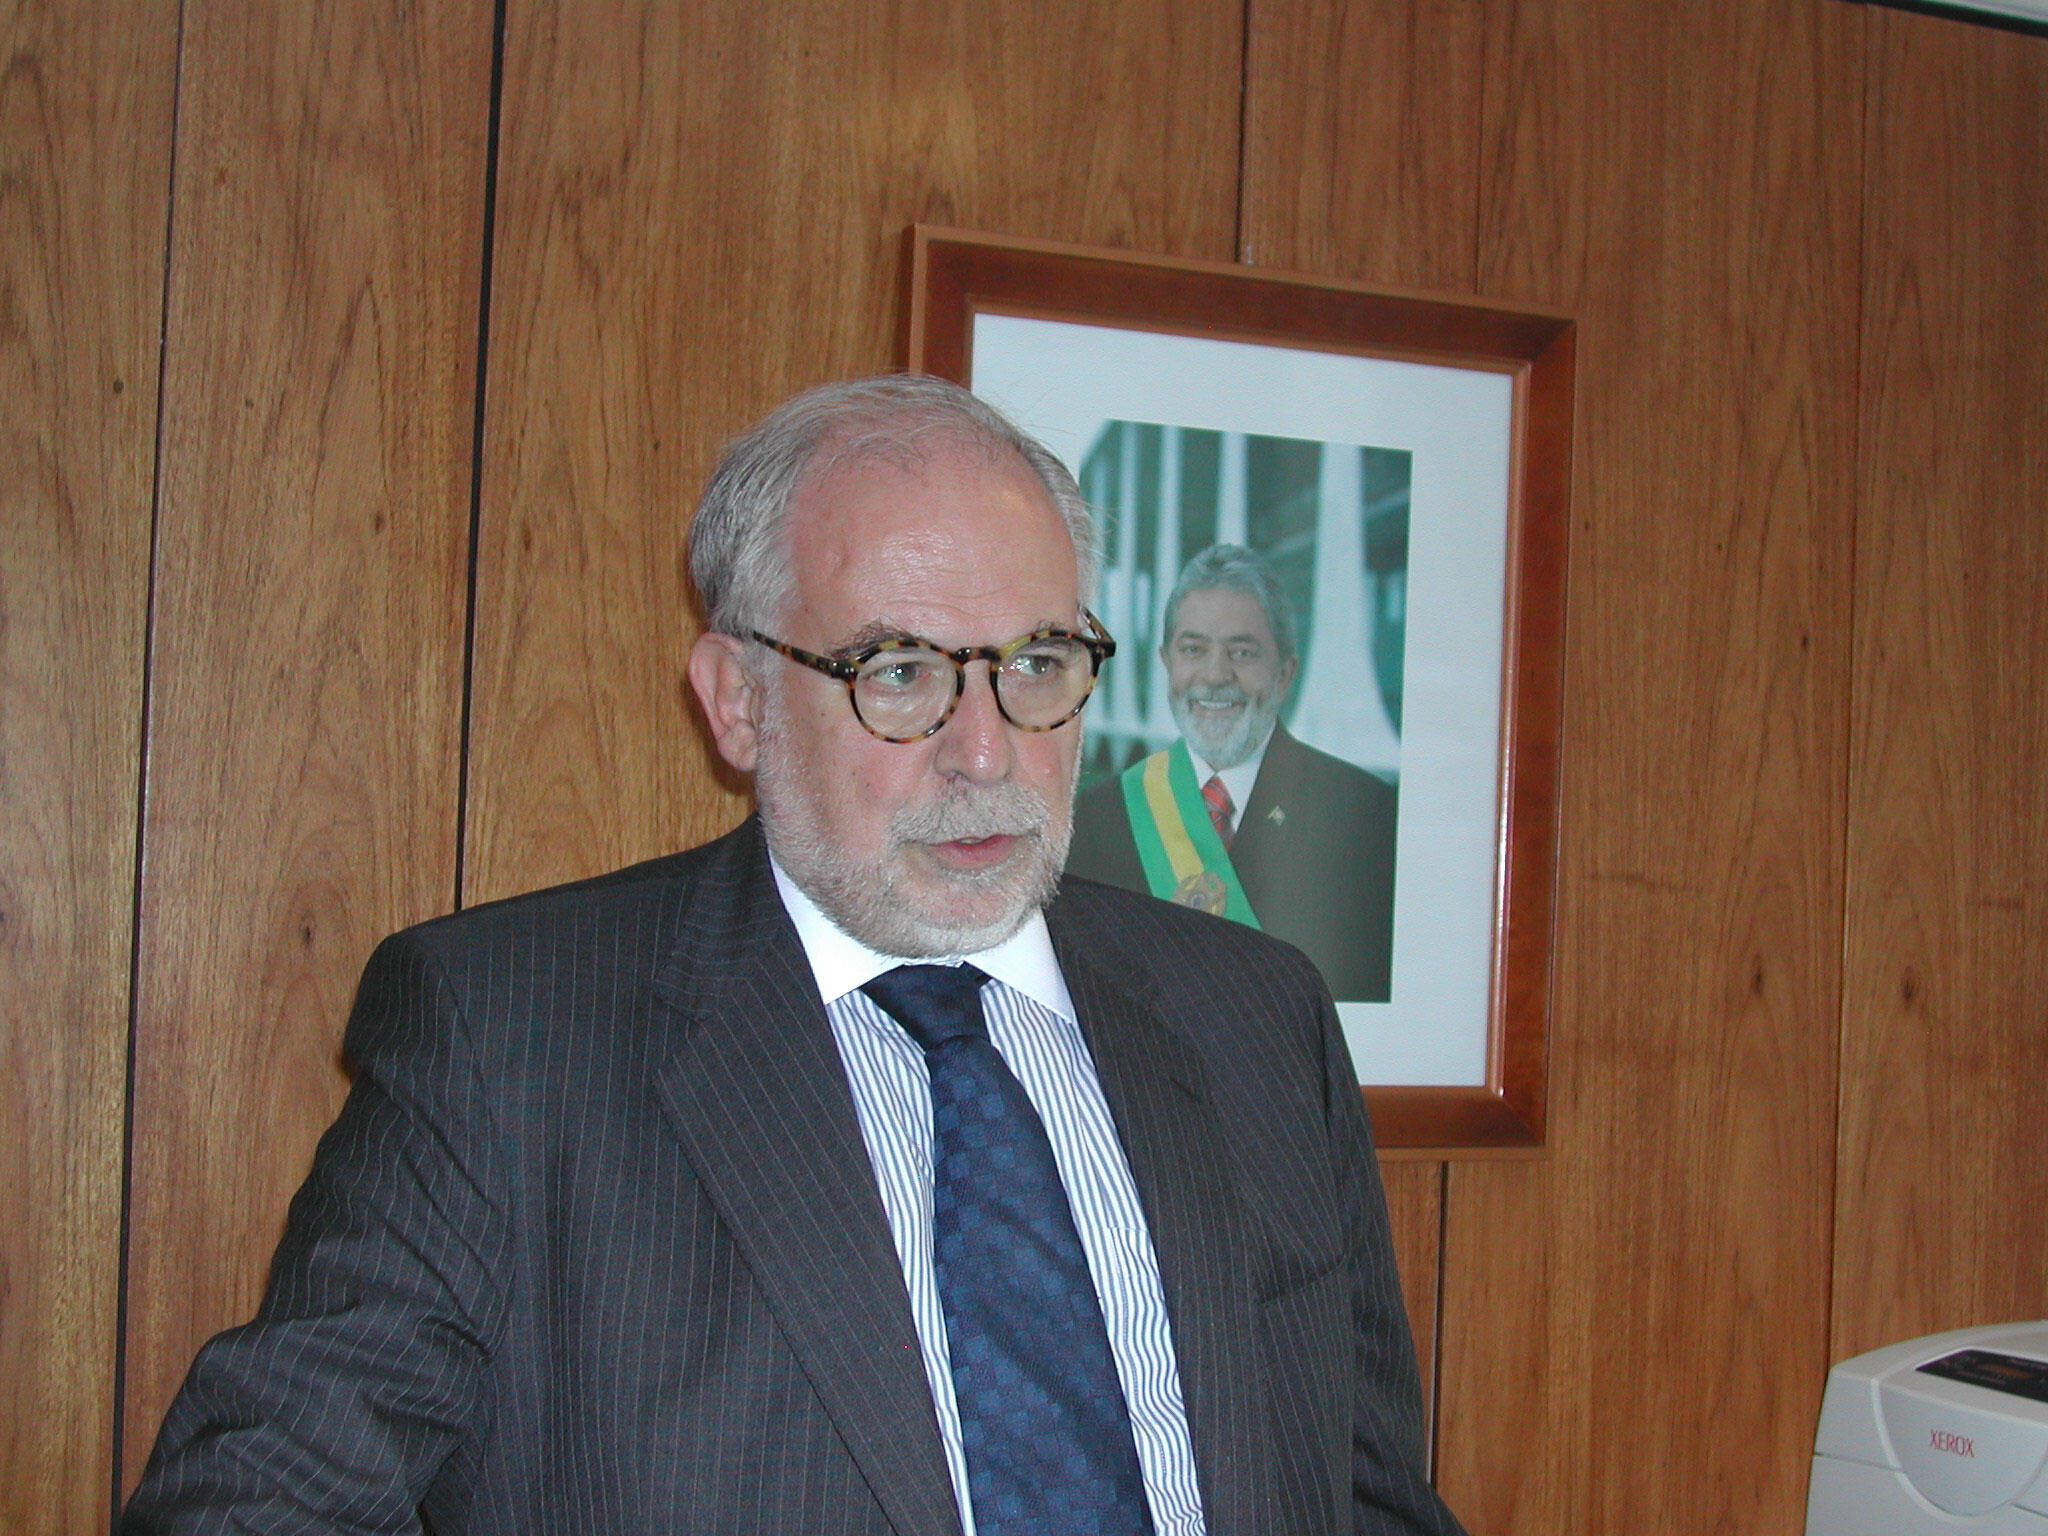 Marco Aurélio Garcia